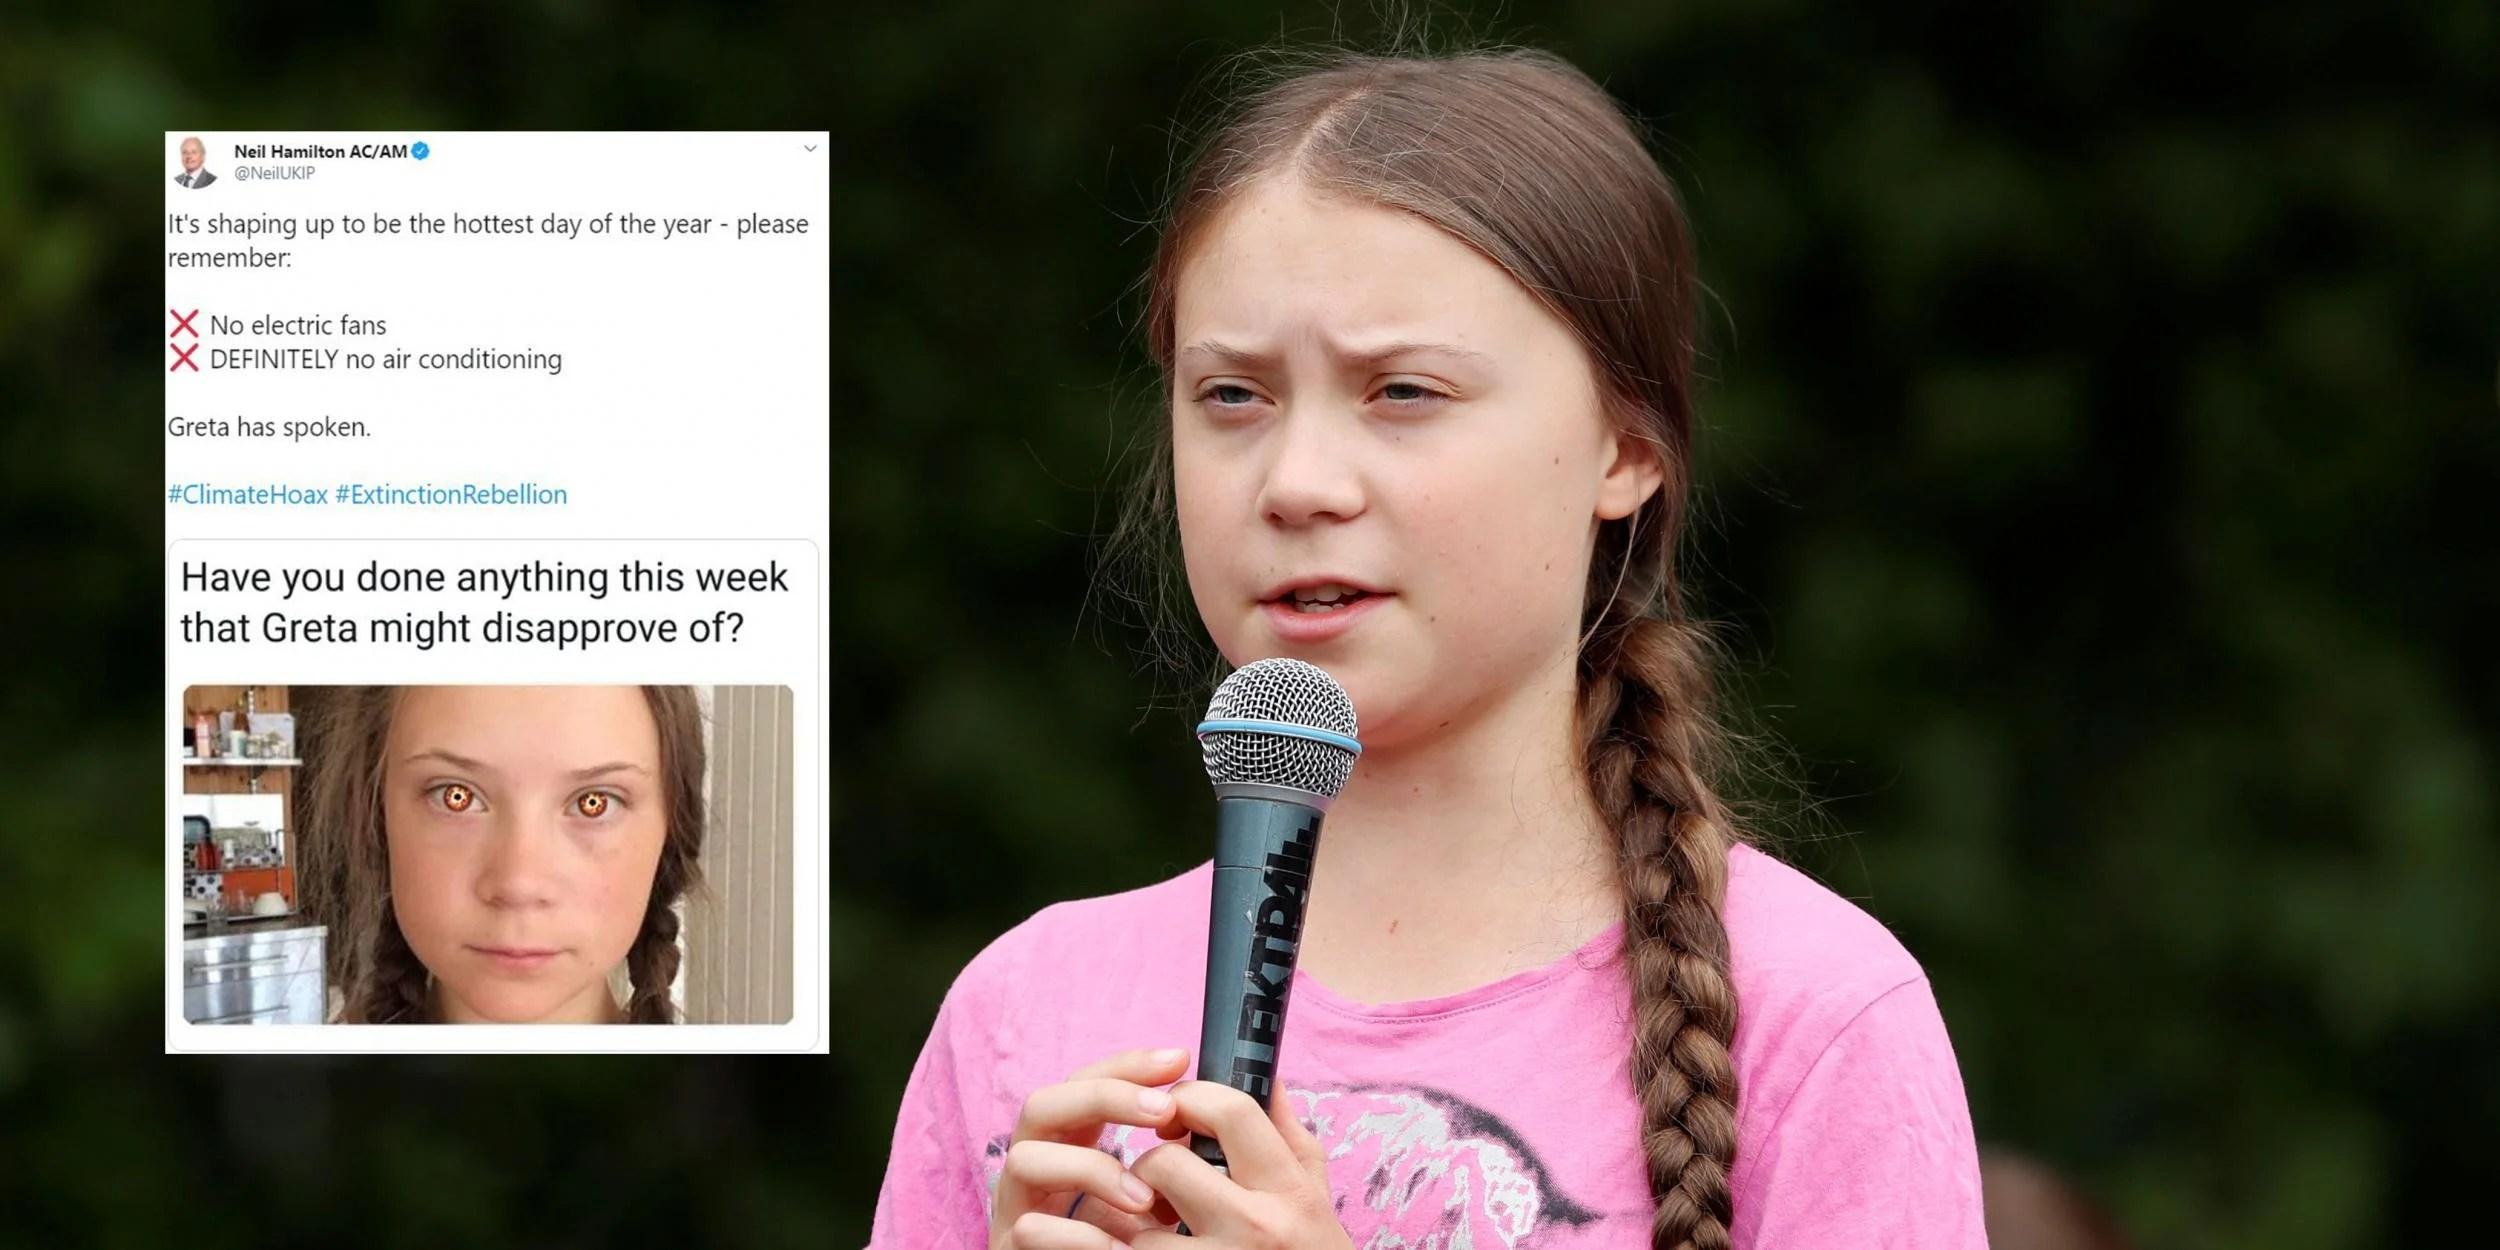 Ukip Wales Leader Condemned For Tweeting Meme Mocking Greta Thunberg